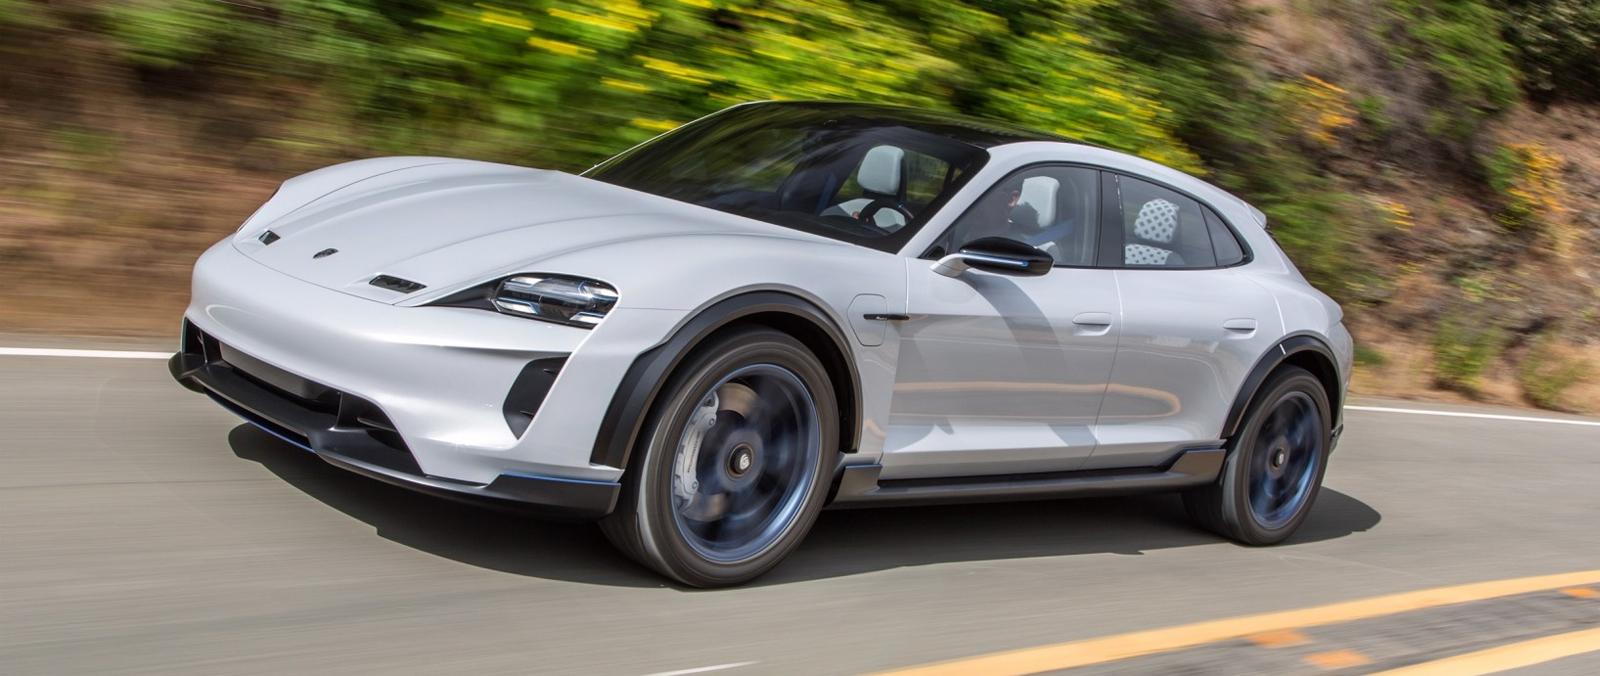 Elektrisch Rijden In Een Elektrische Auto Lease Rijden Elektro